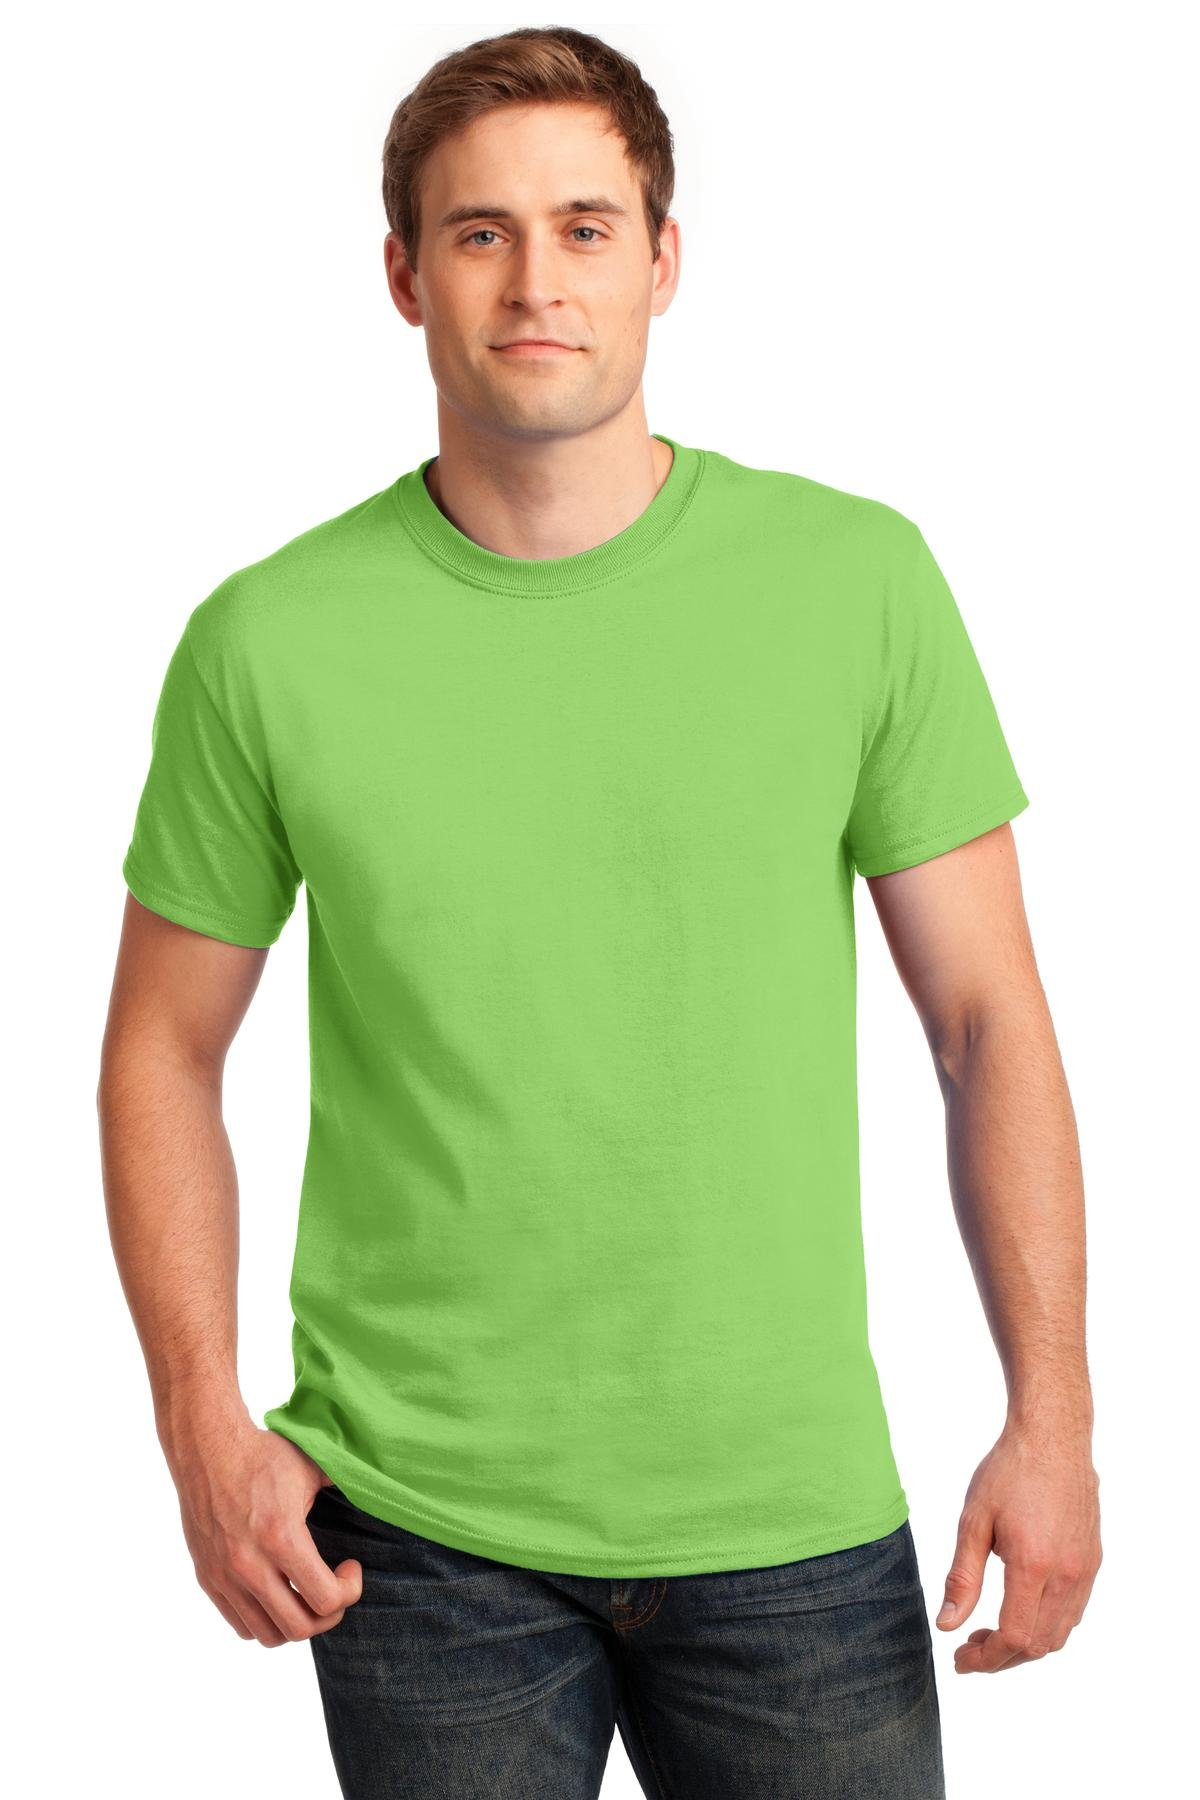 Gildan mens Ultra Cotton 6 oz. T-Shirt(G200)-LIME-4XL